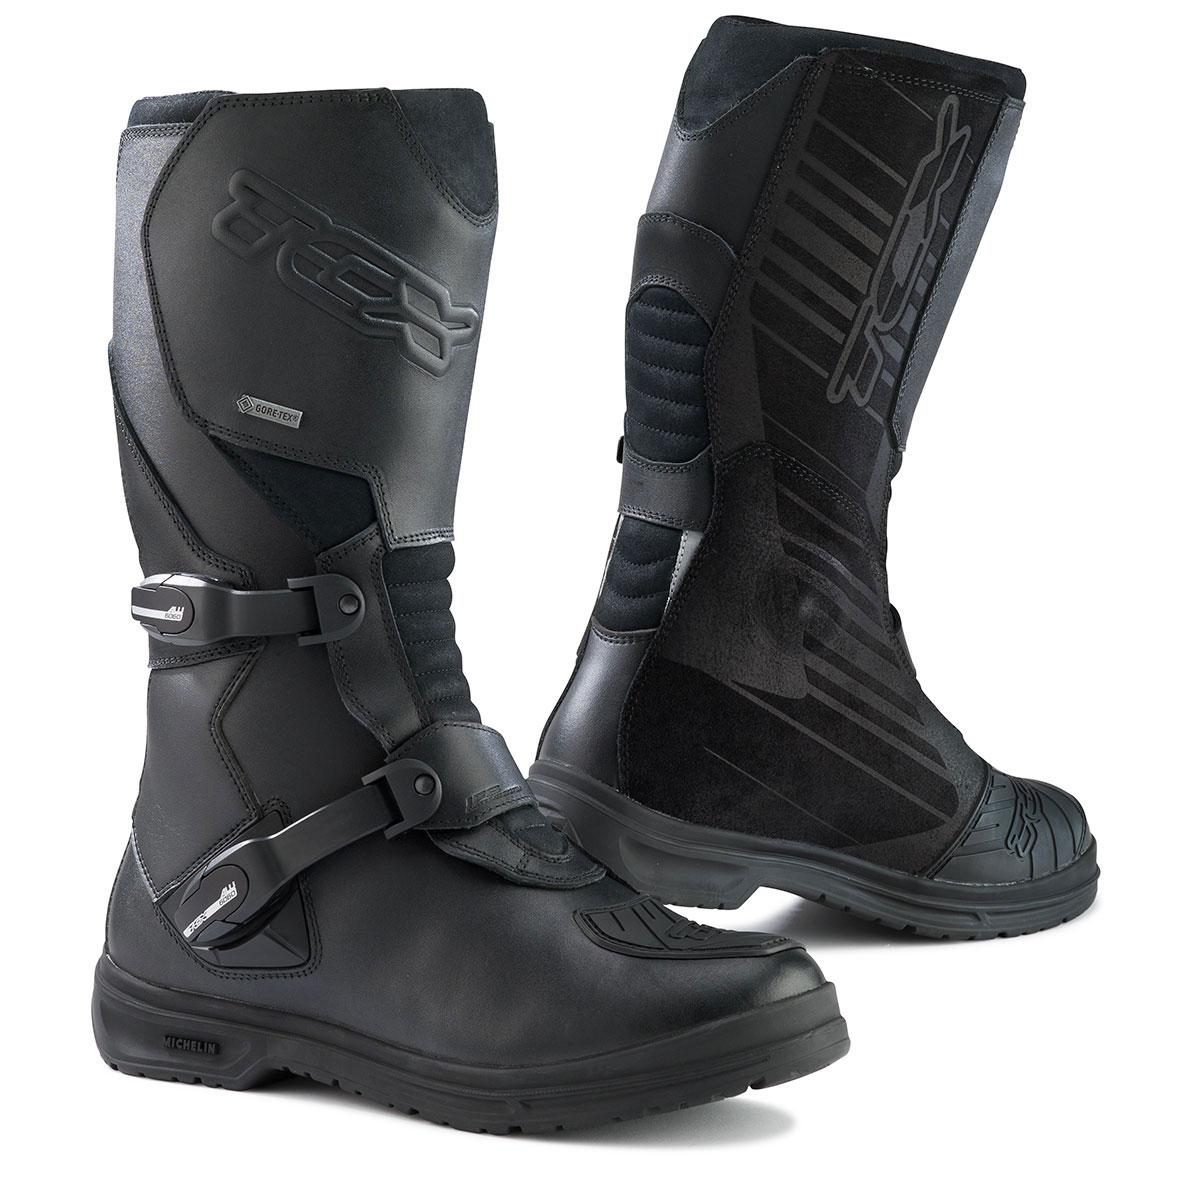 RST Boots Tundra CE Ladies Waterproof Black//Black 40